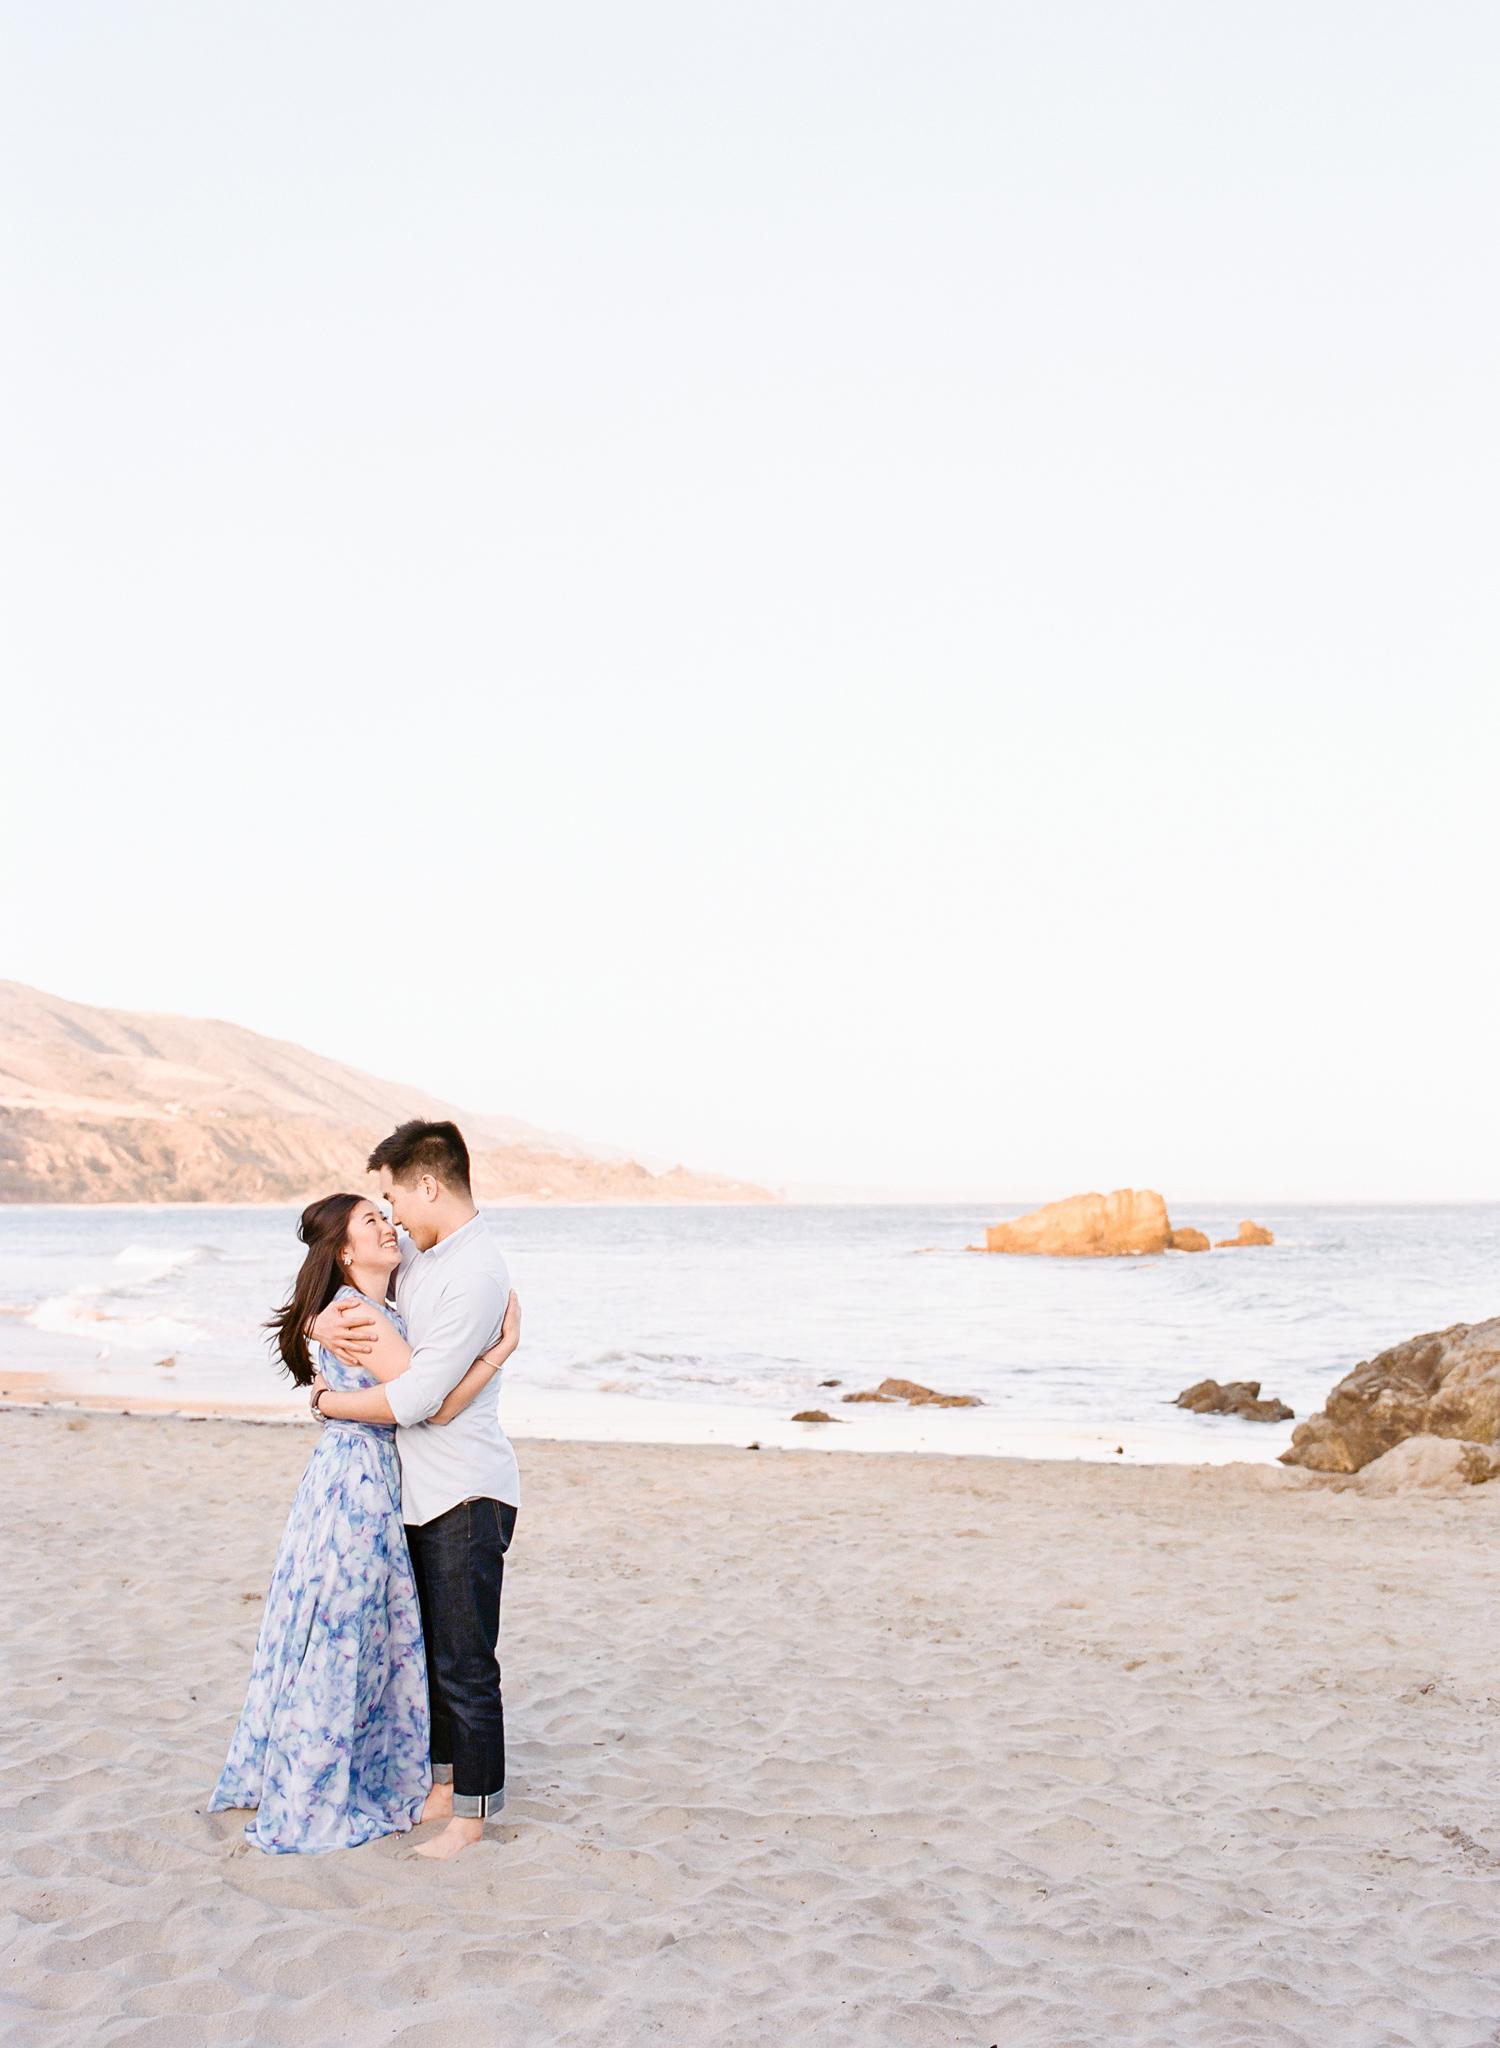 043-Jen-Wojcik-Photography-San-Diego-Wedding-Photographer.jpg